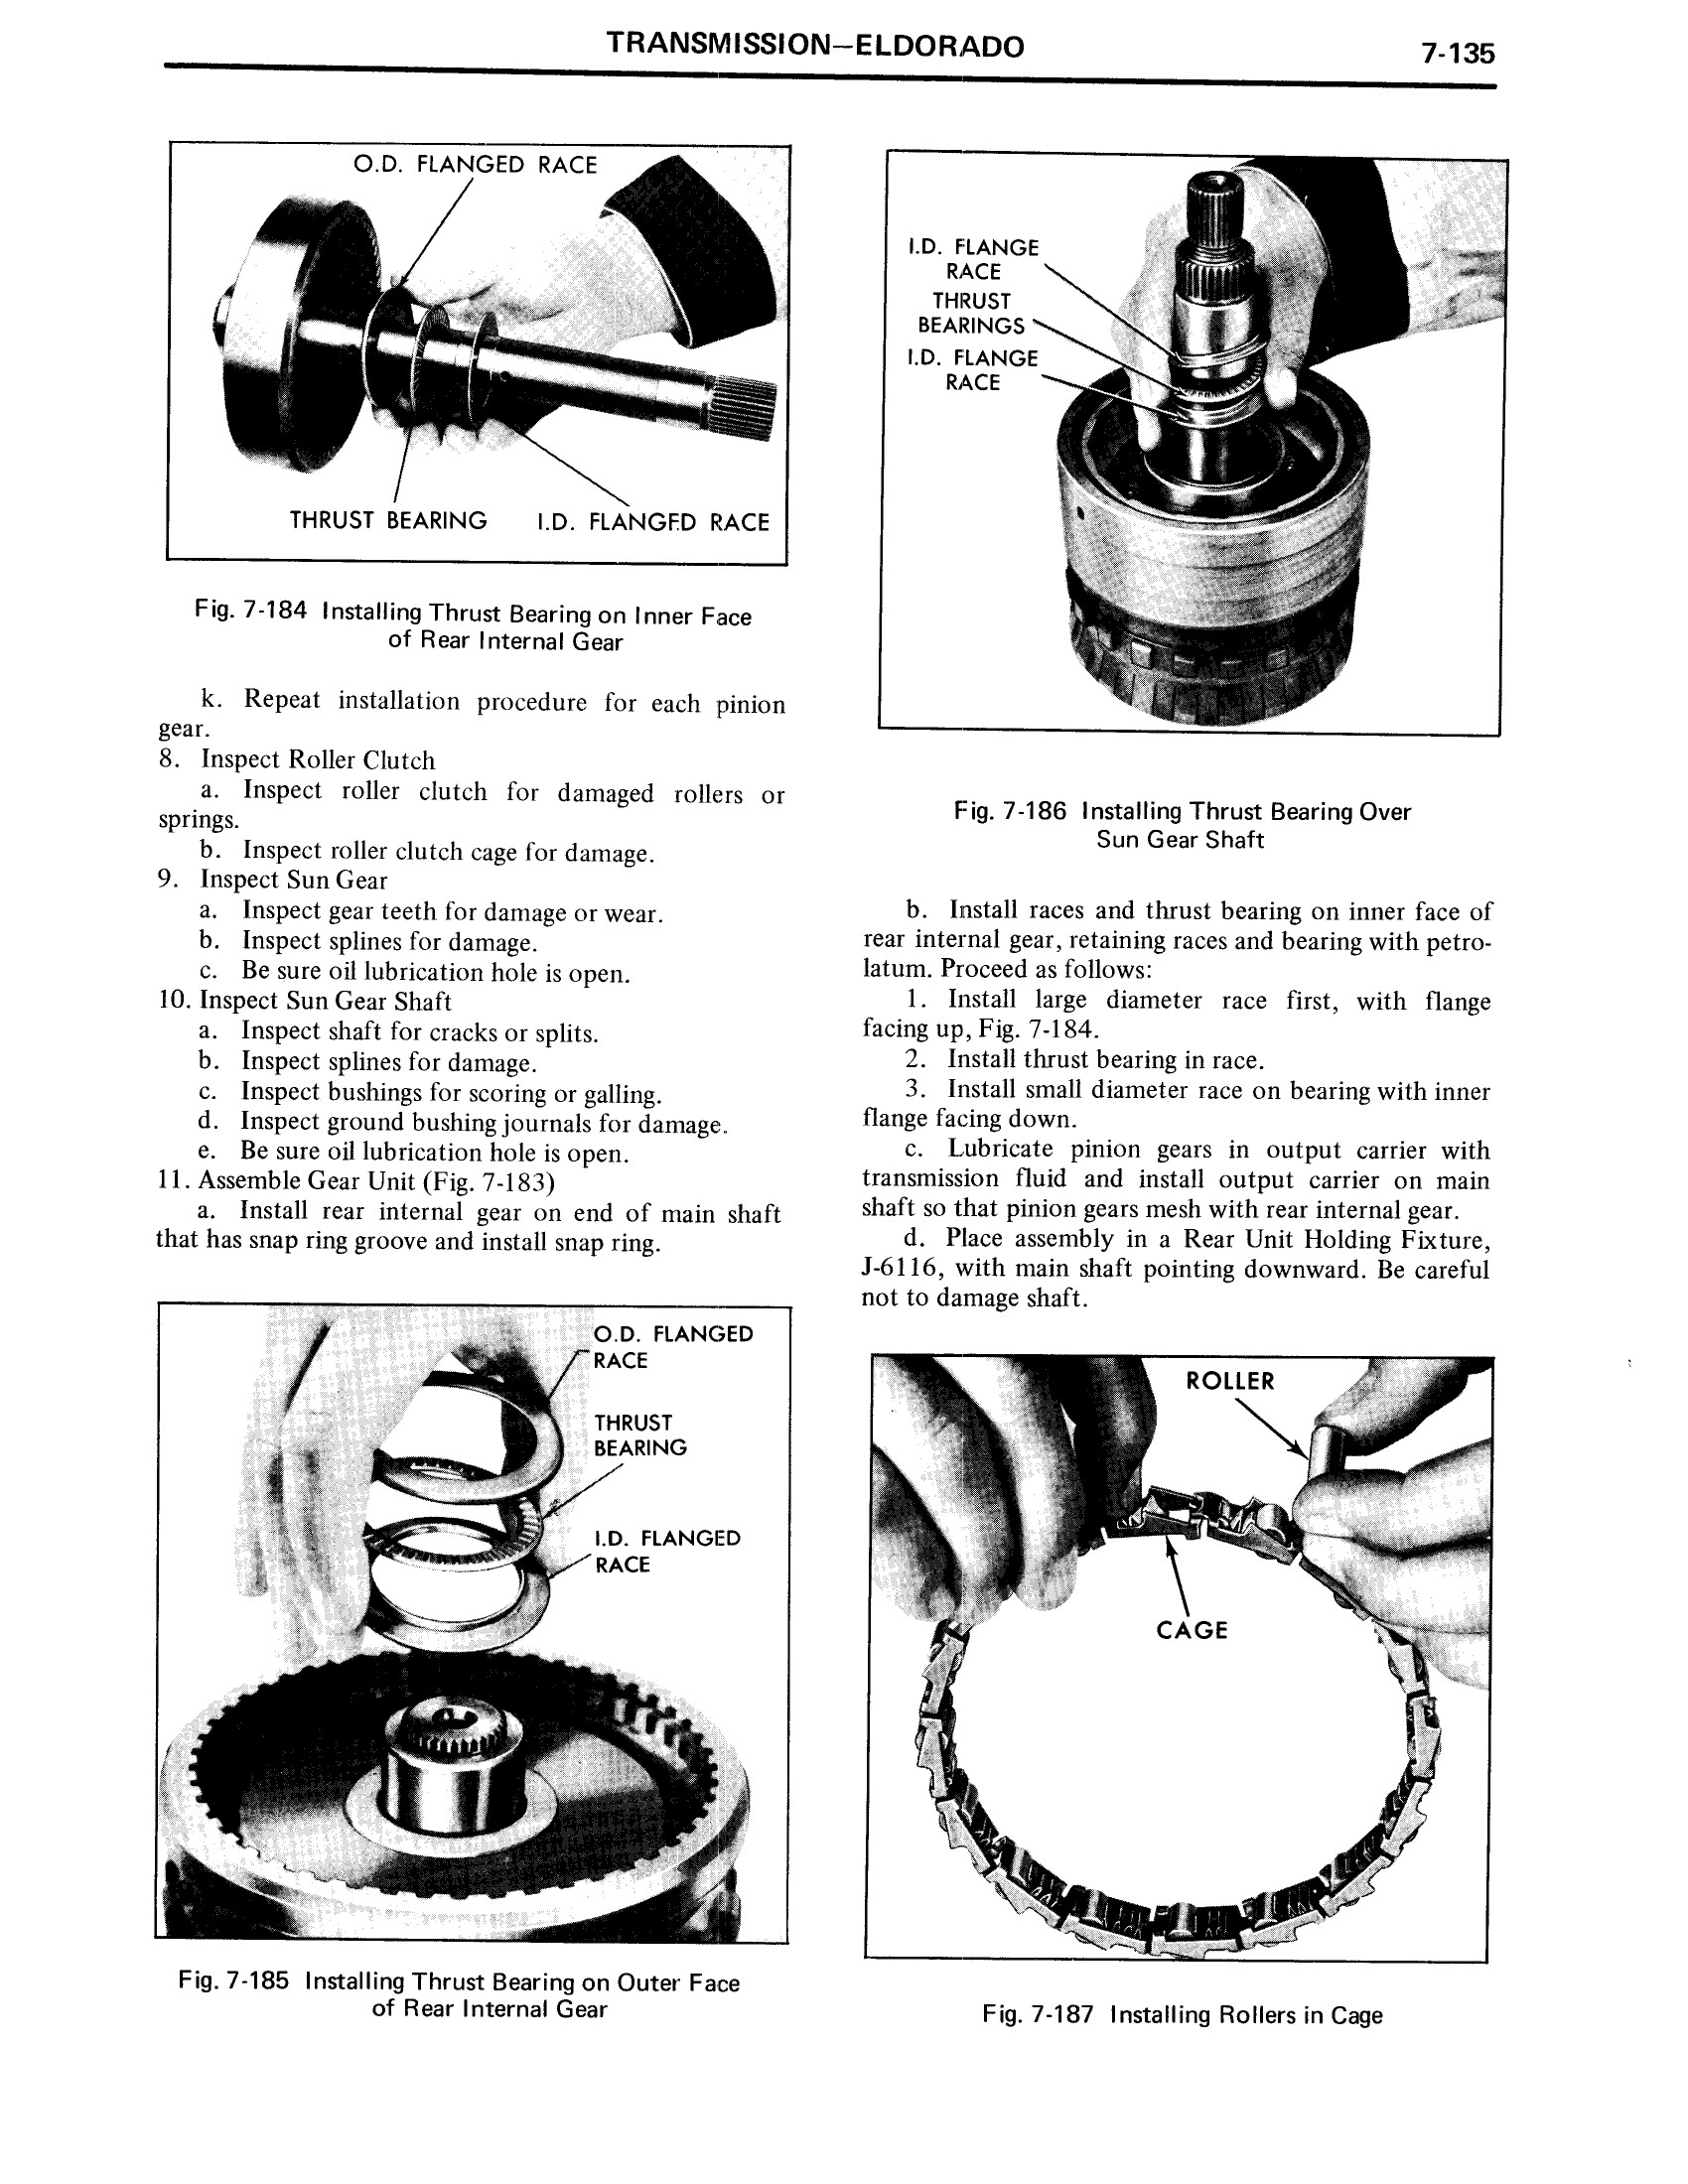 1971 Cadillac Shop Manual- Transmission Page 135 of 156